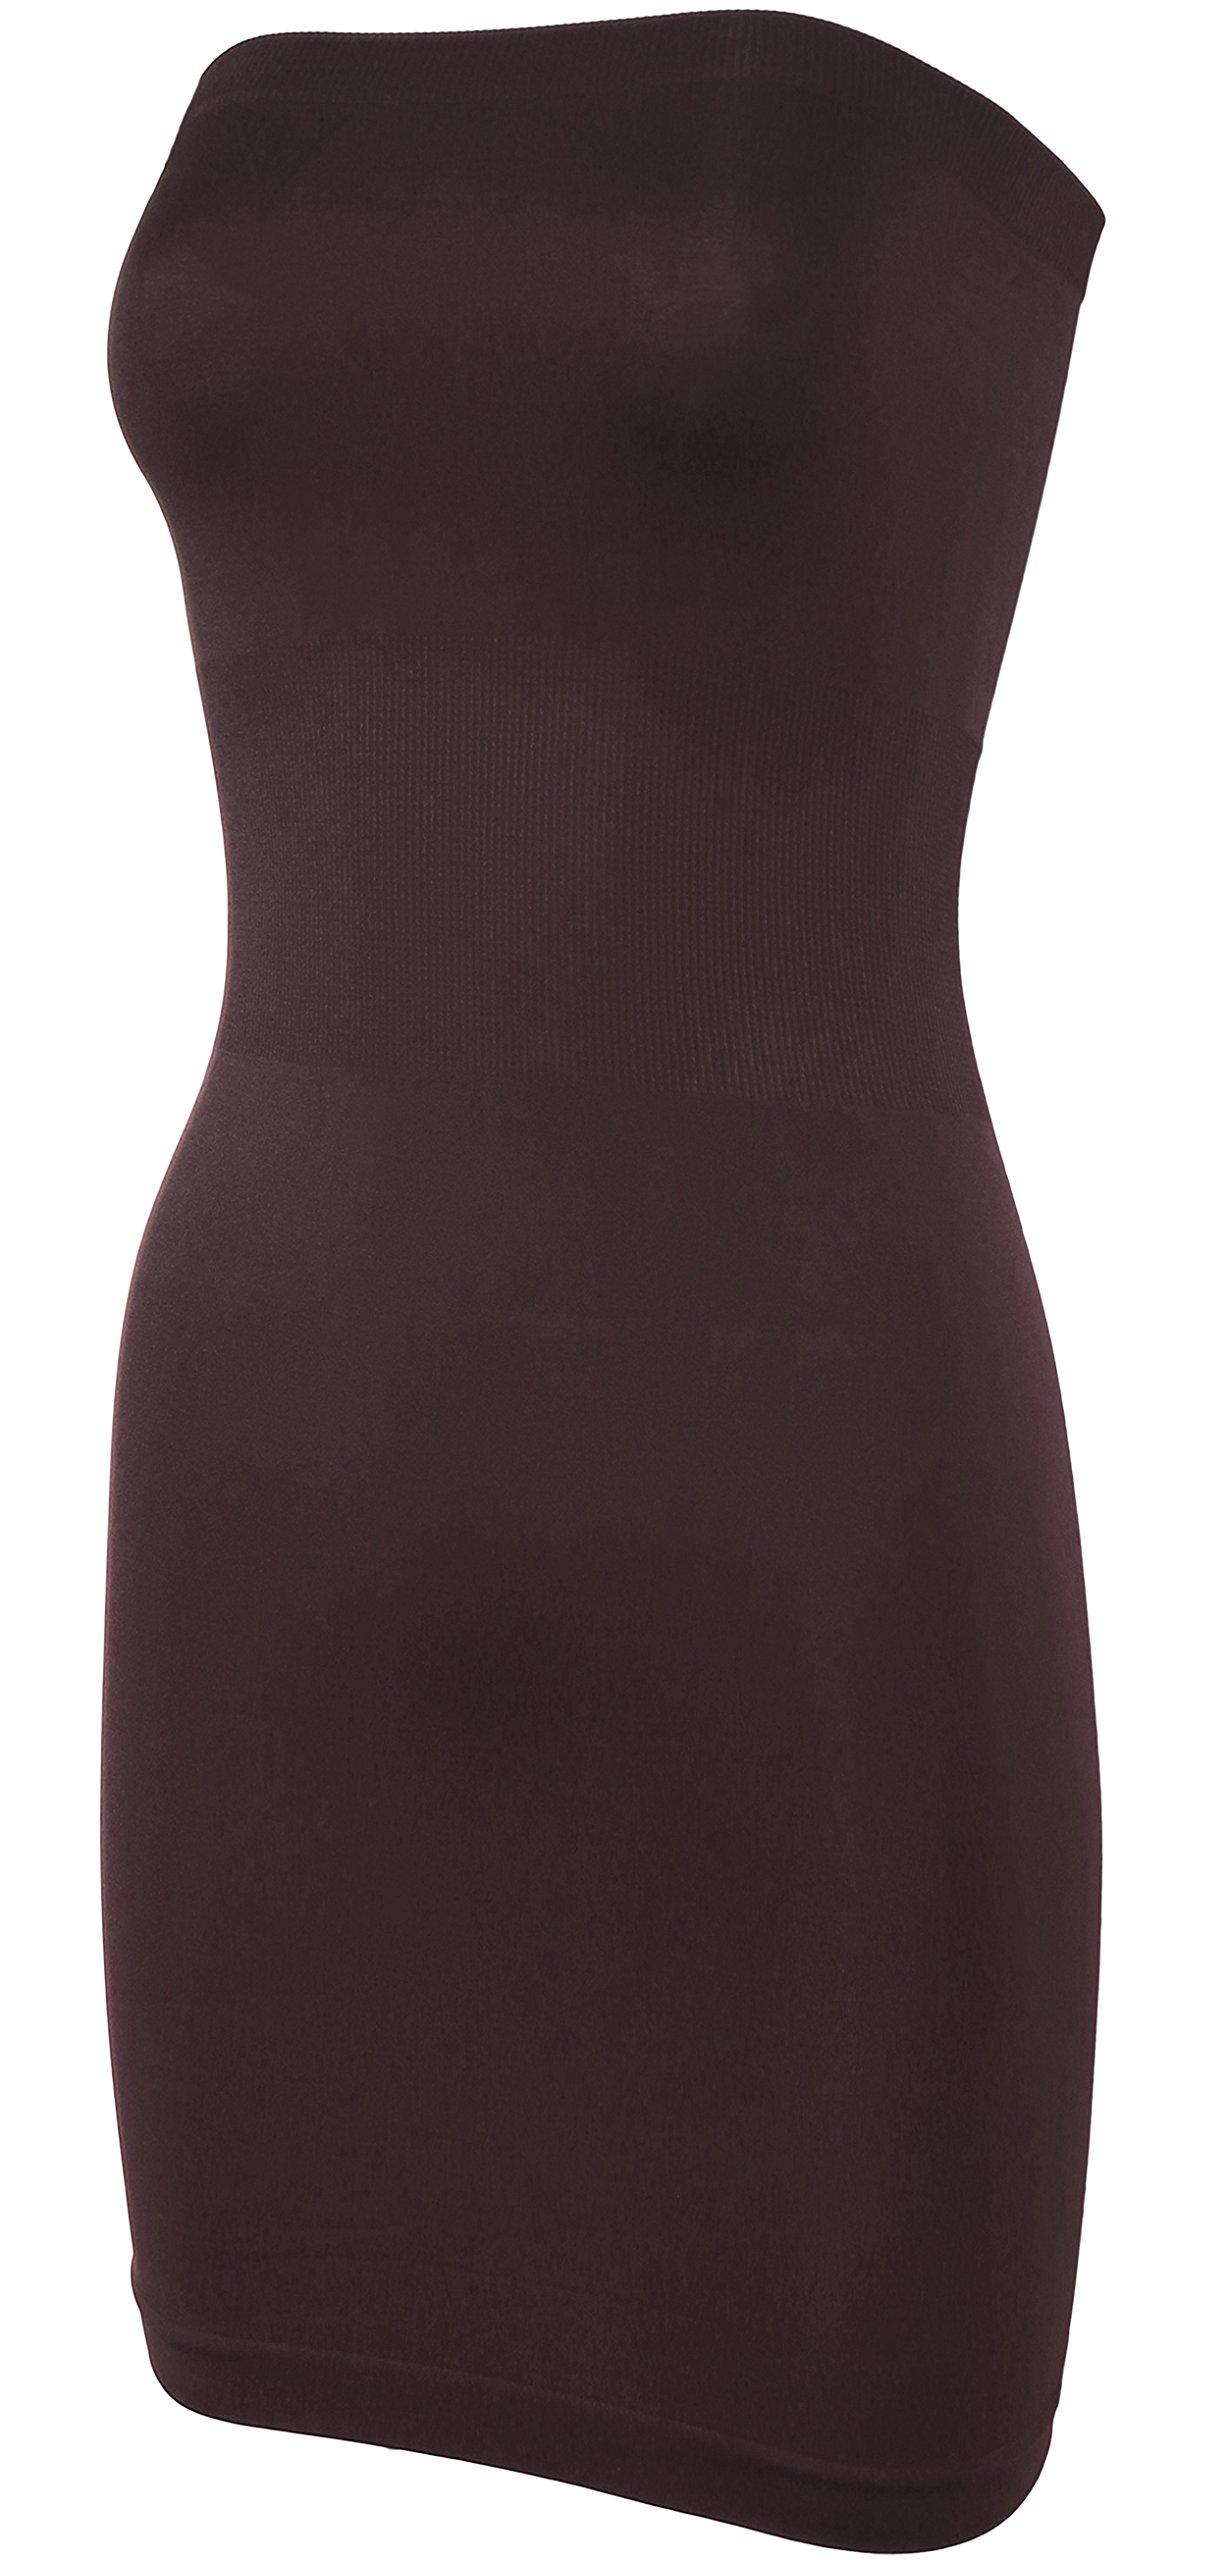 KMystic Seamless Strapless Tube Slip Dress (Brown),One Size